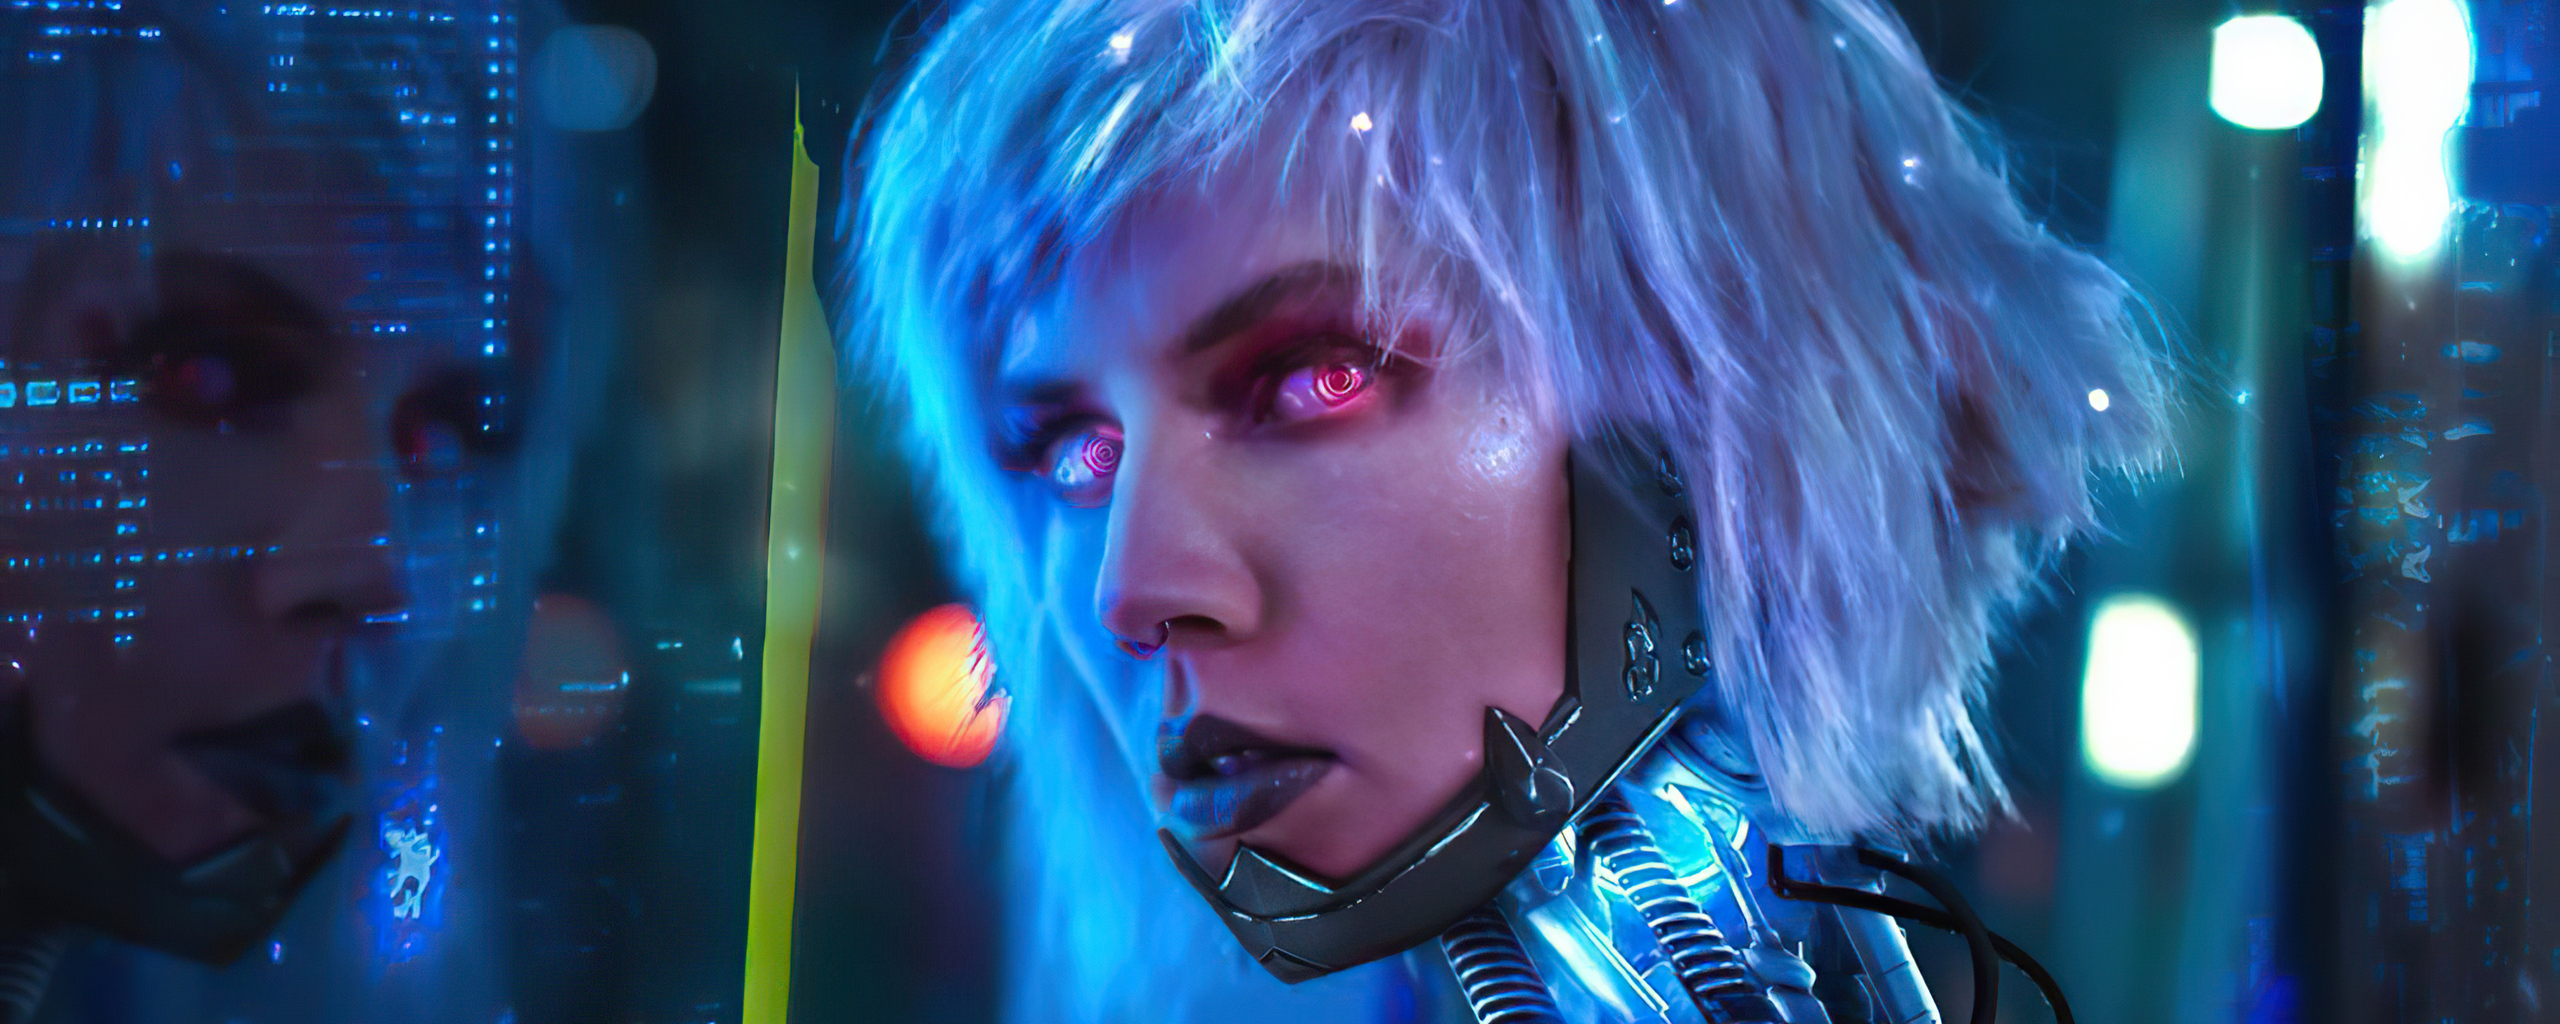 2560x1024 Cyberpunk 2077 Cosplay New 2020 2560x1024 ...